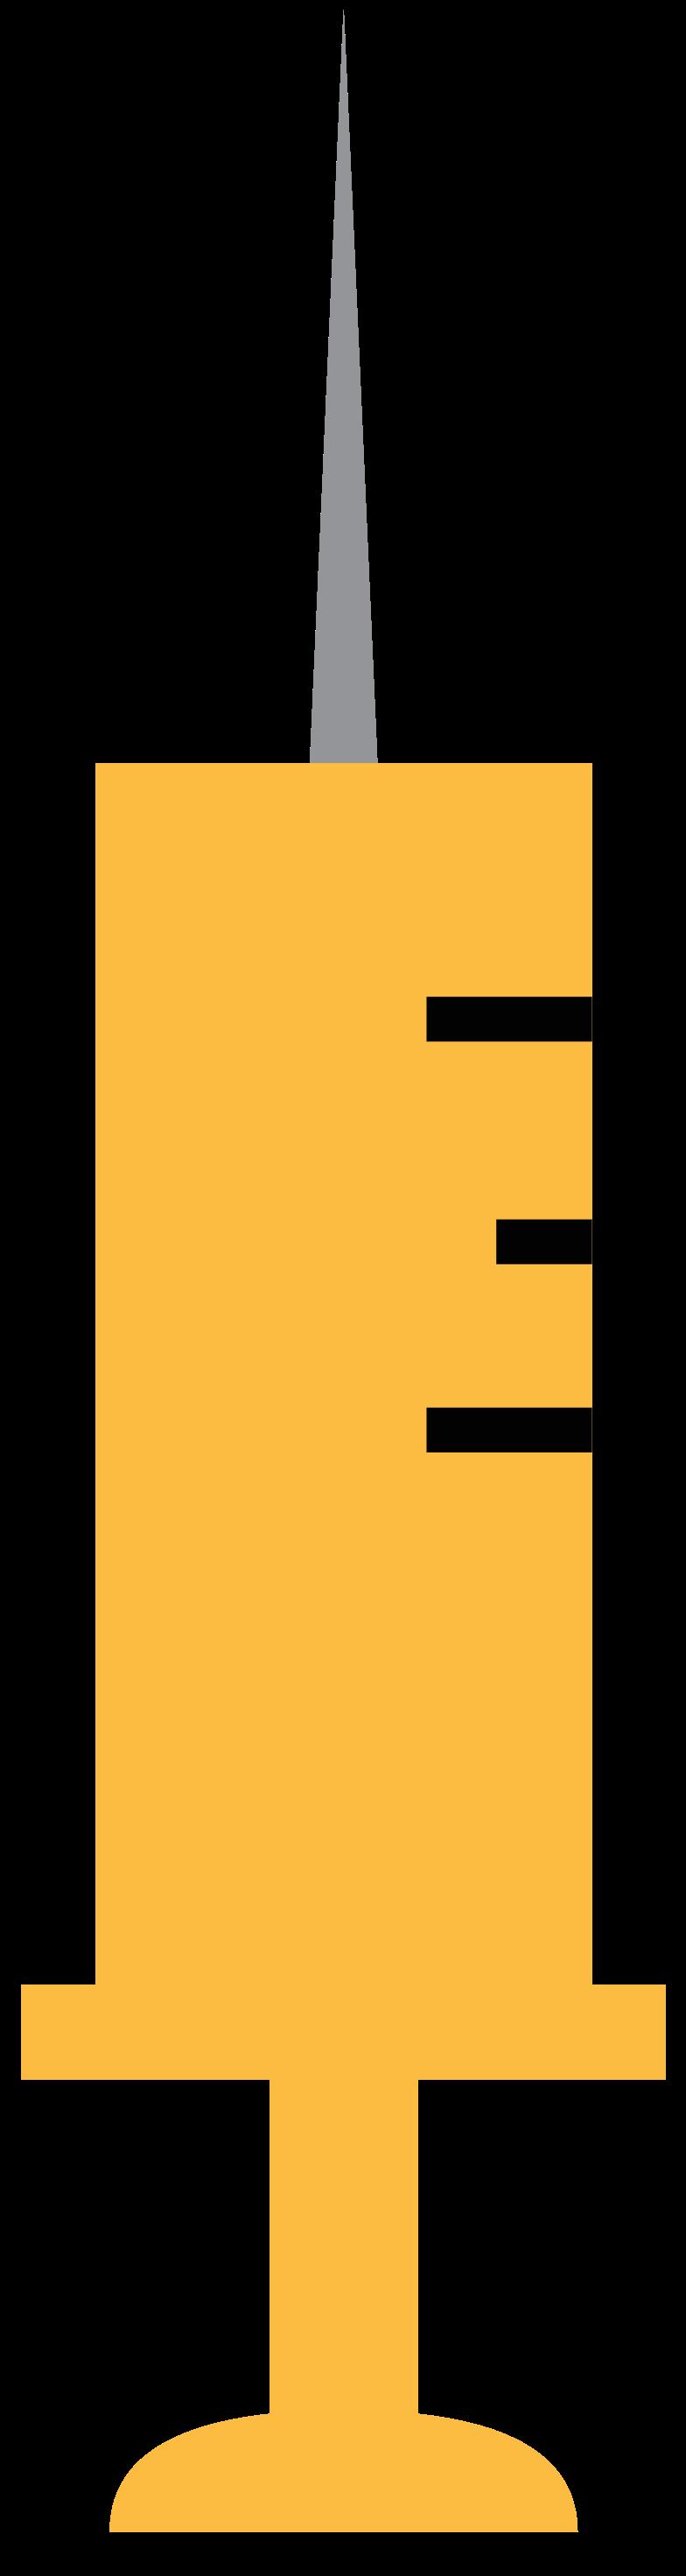 Seringa Clipart illustration in PNG, SVG